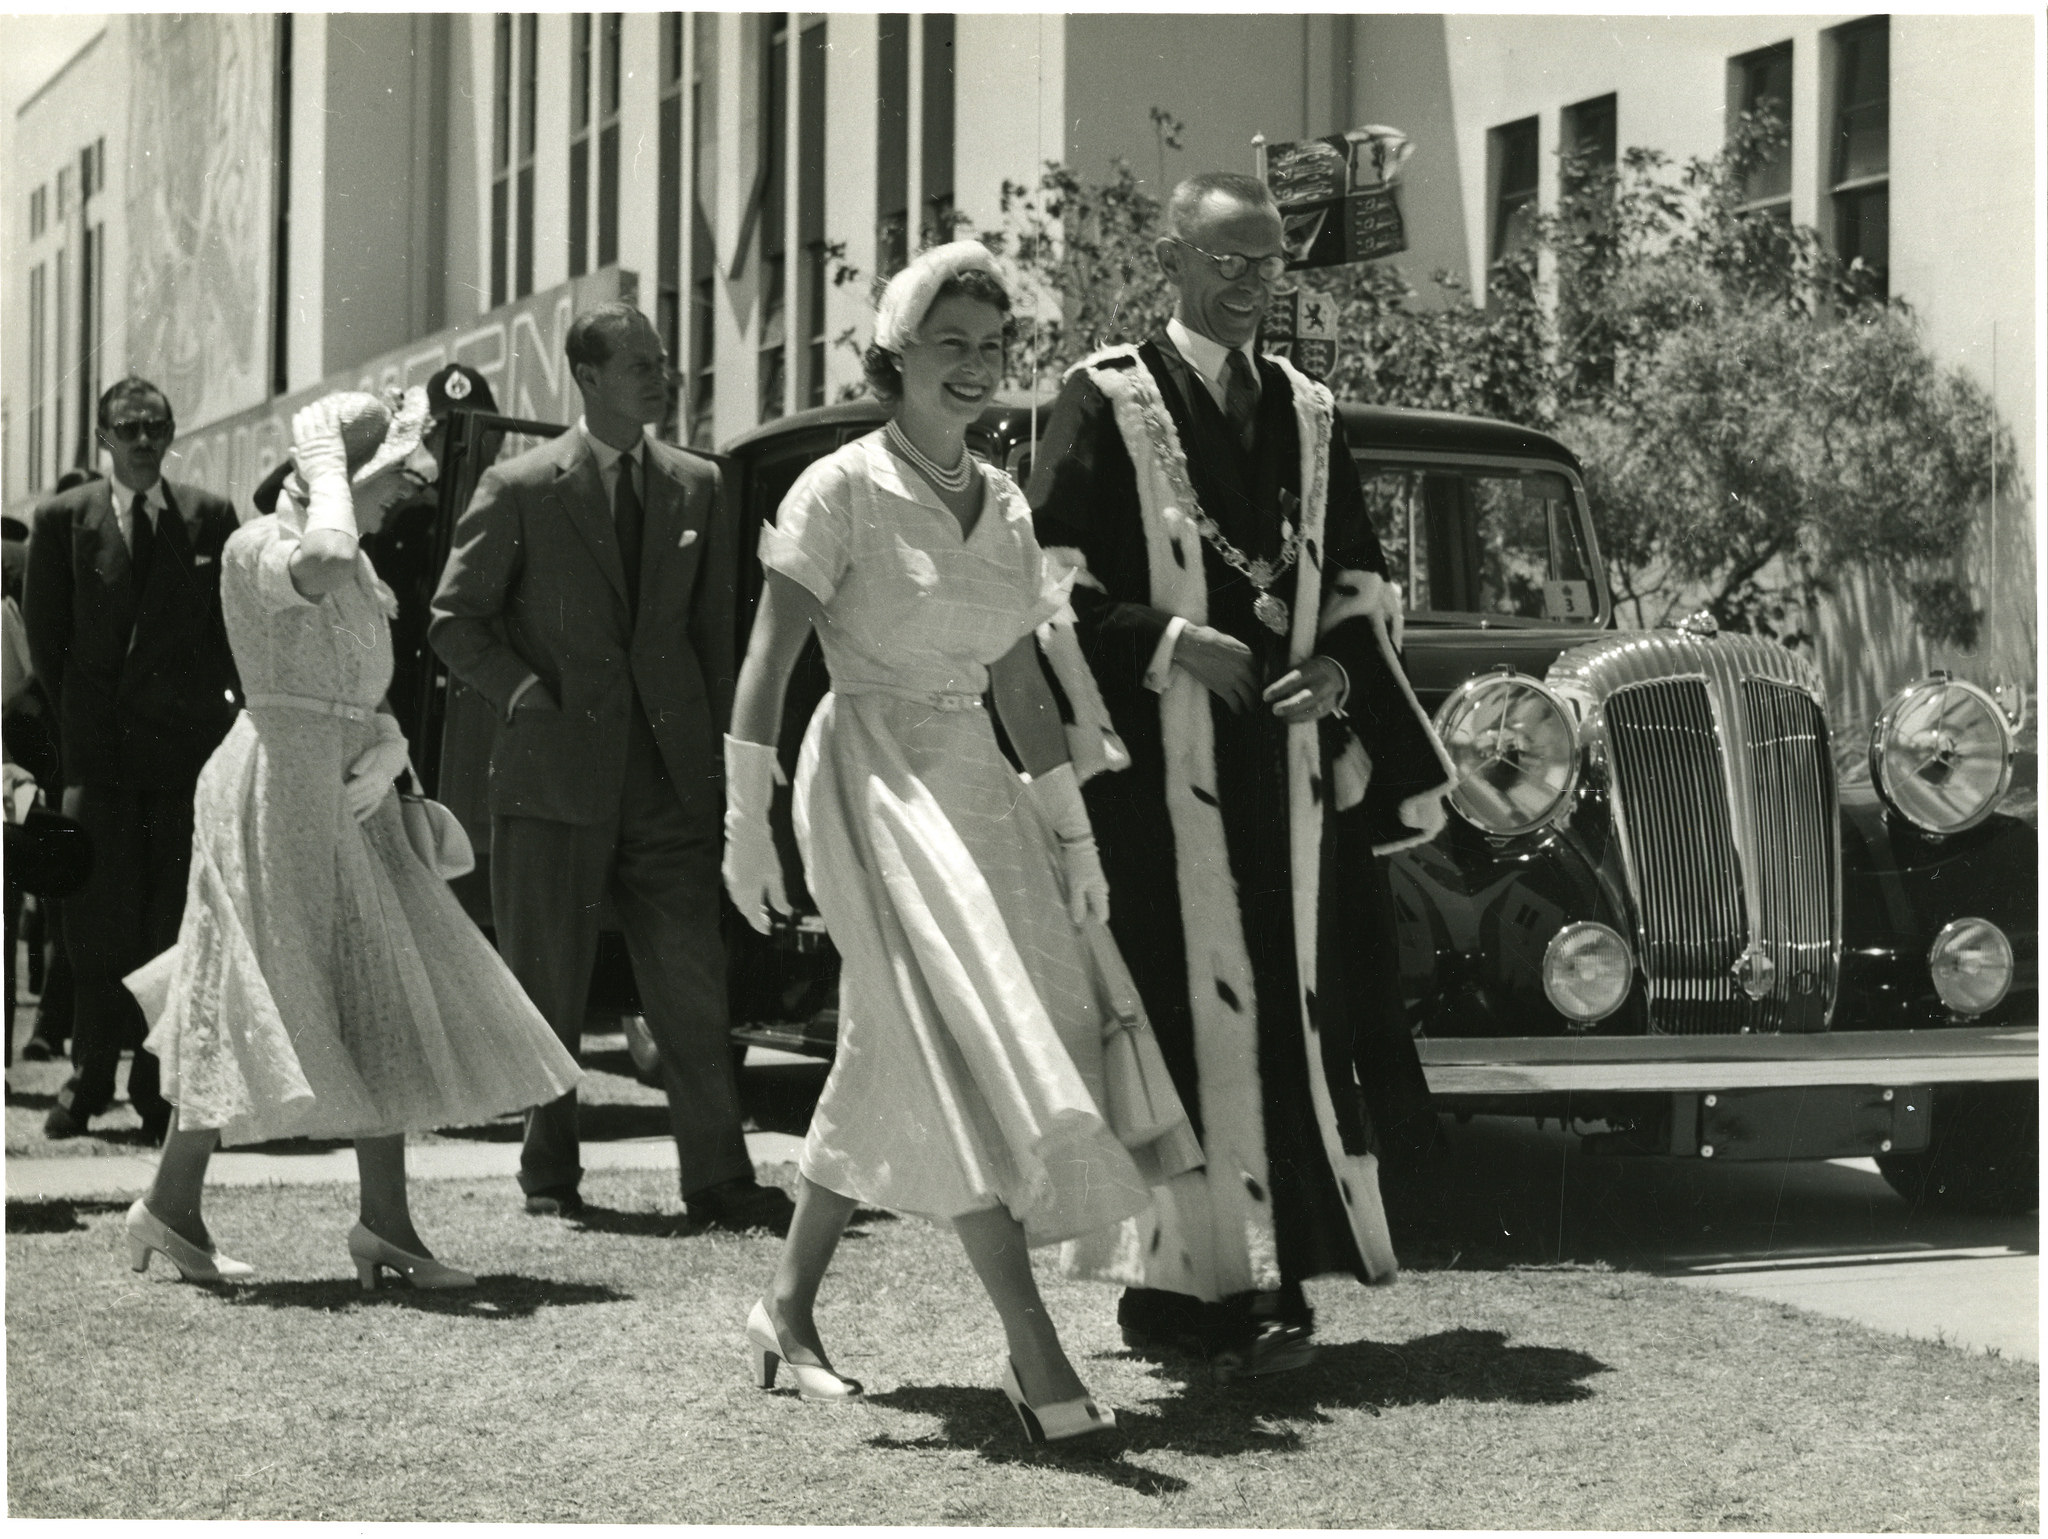 New Zealand Archives via Flickr